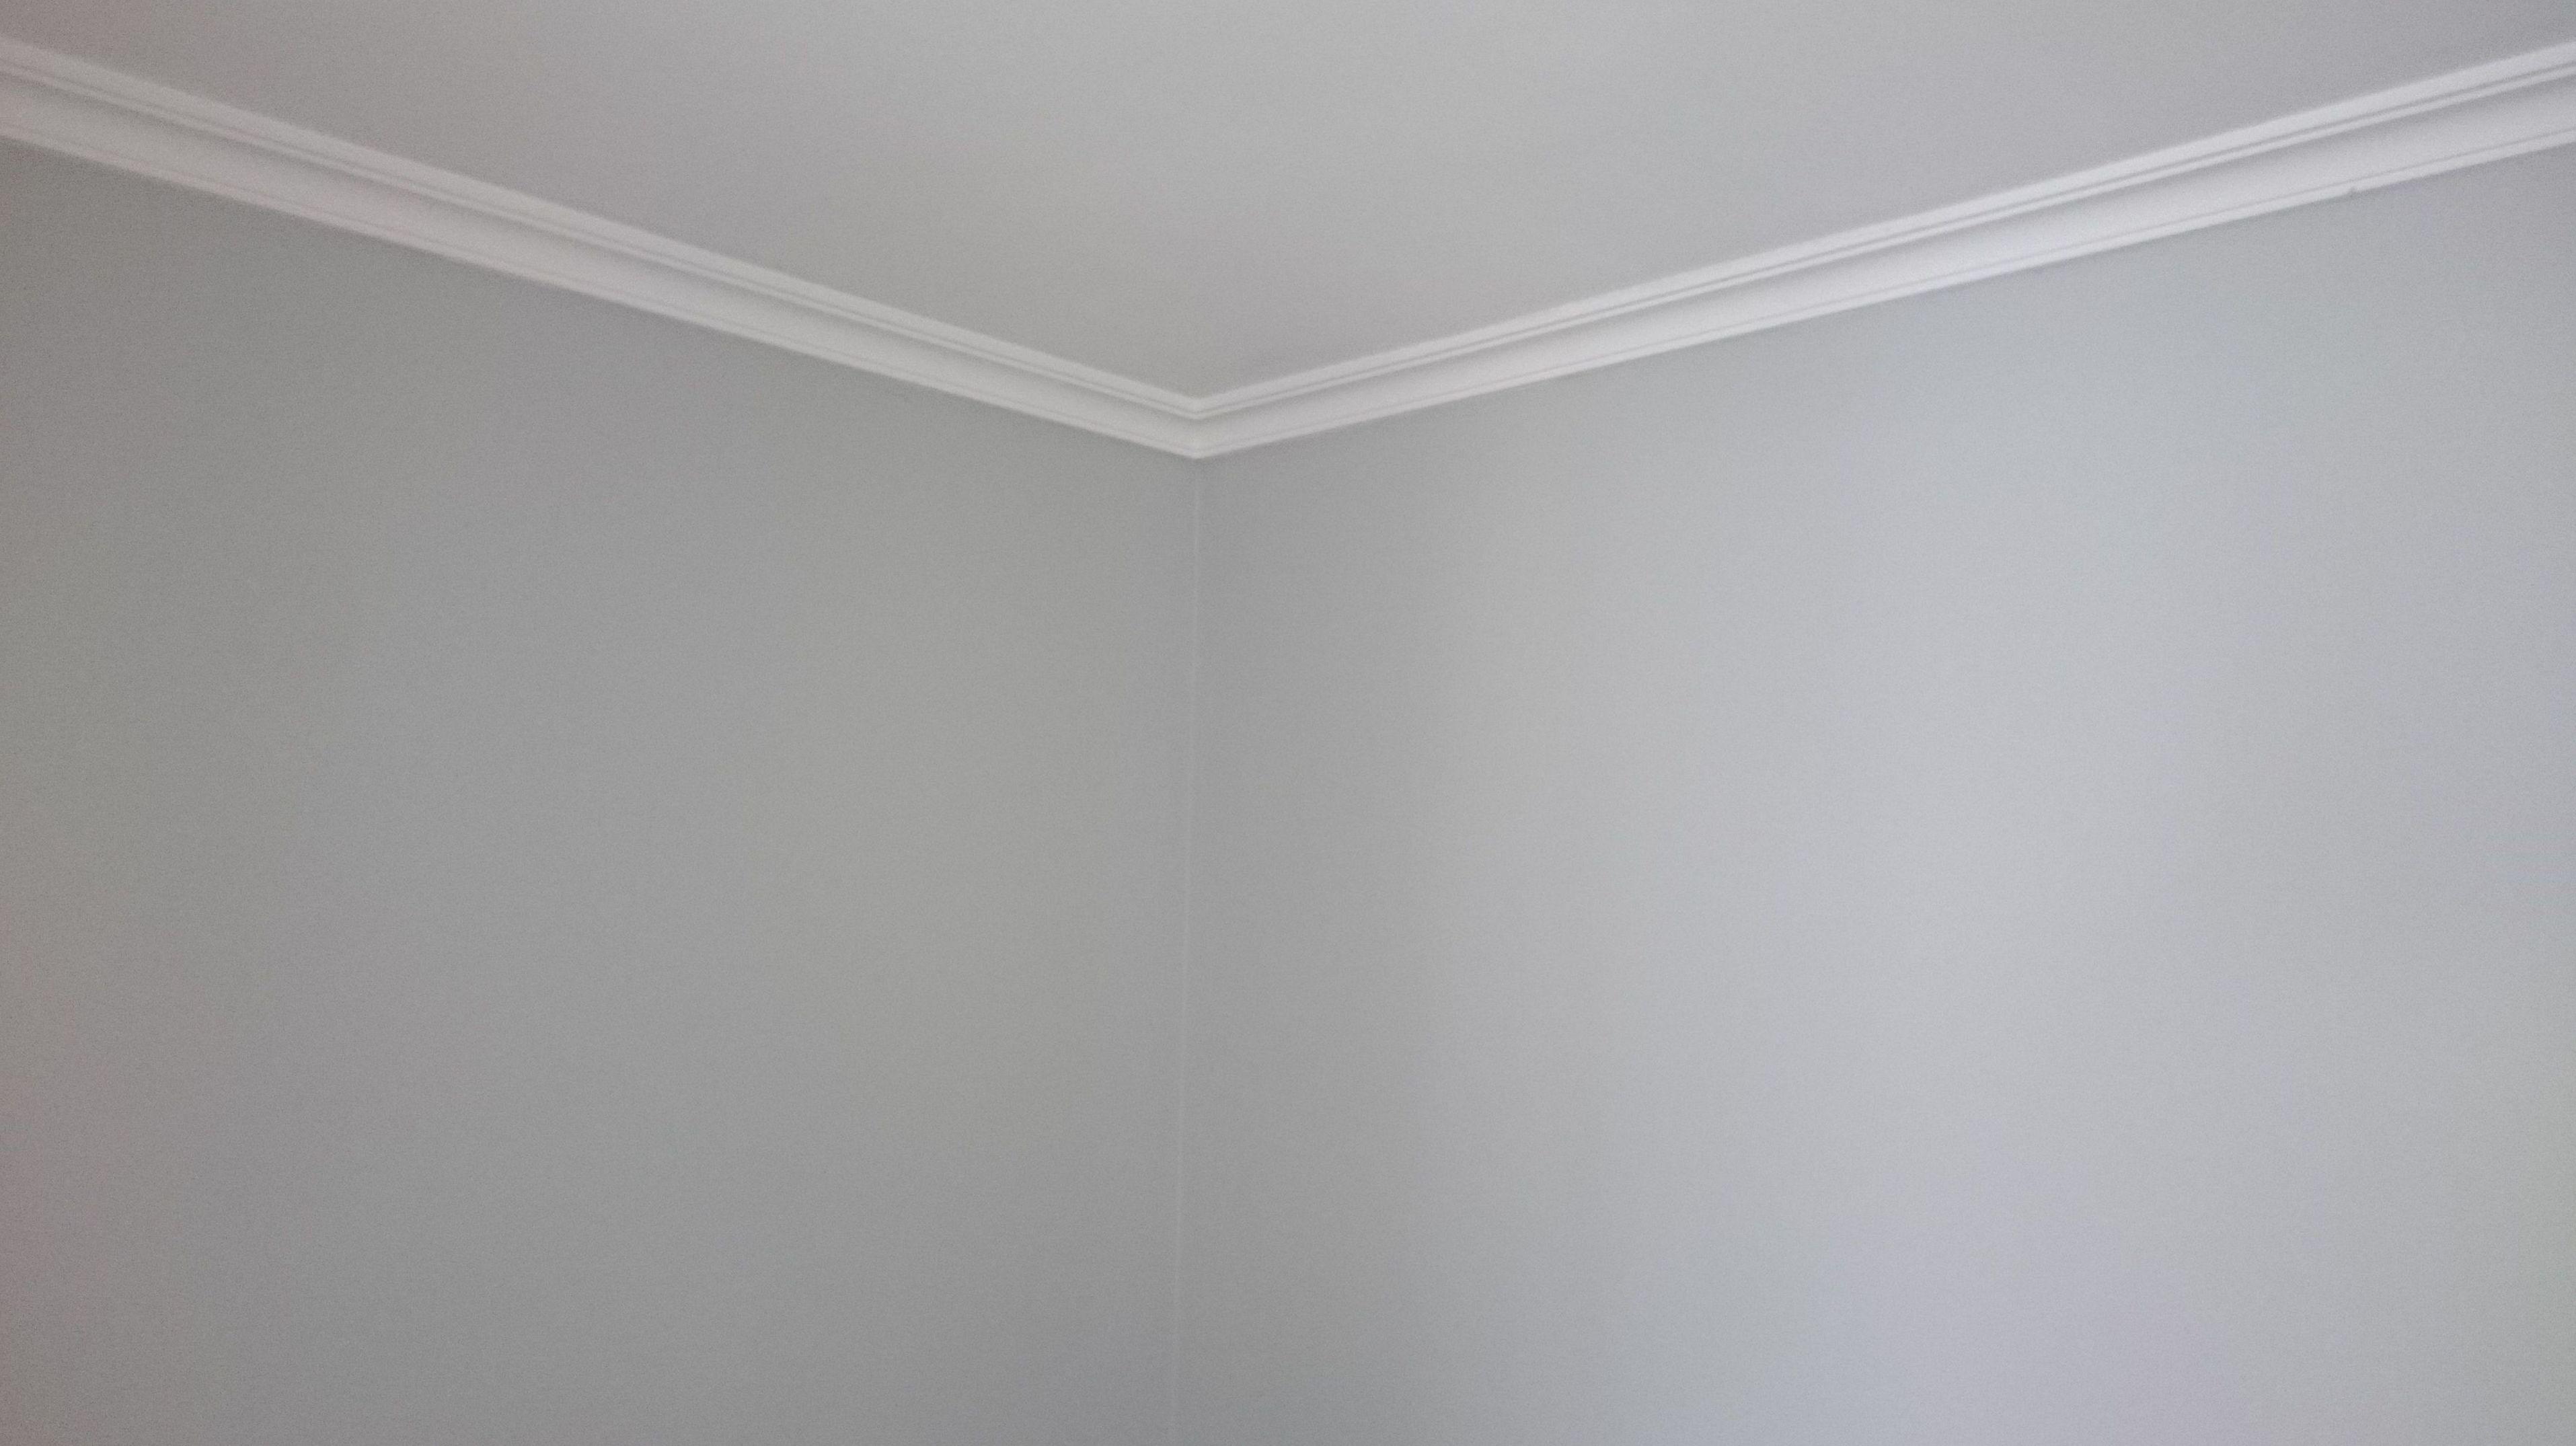 Preparación de paredes para pintura